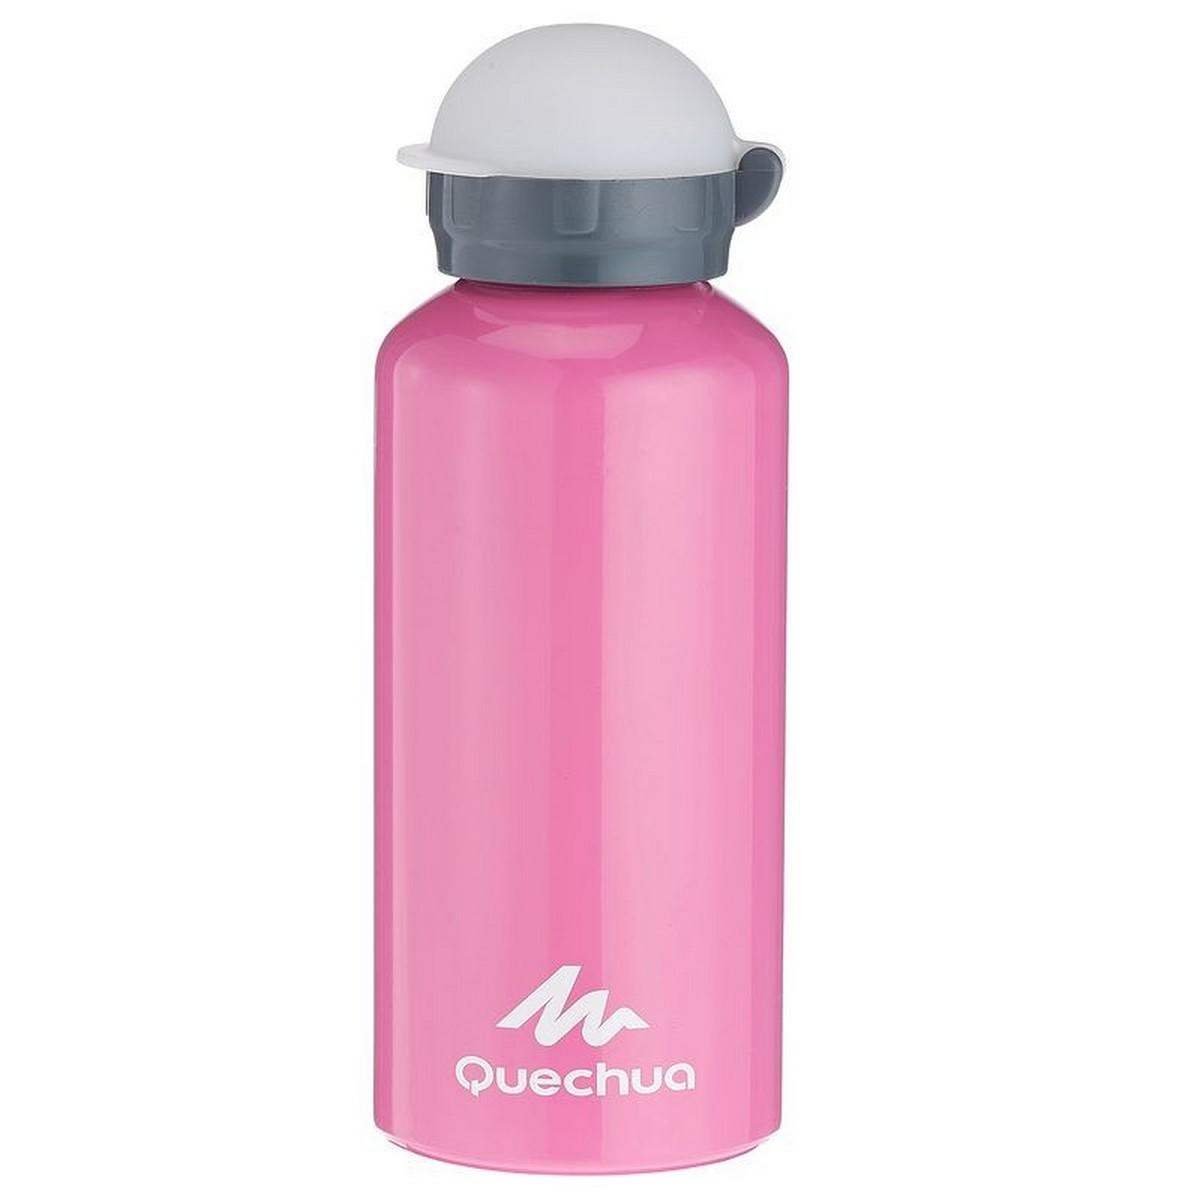 Buy Quechua Water Bottle 06 L Alu Online in India ...